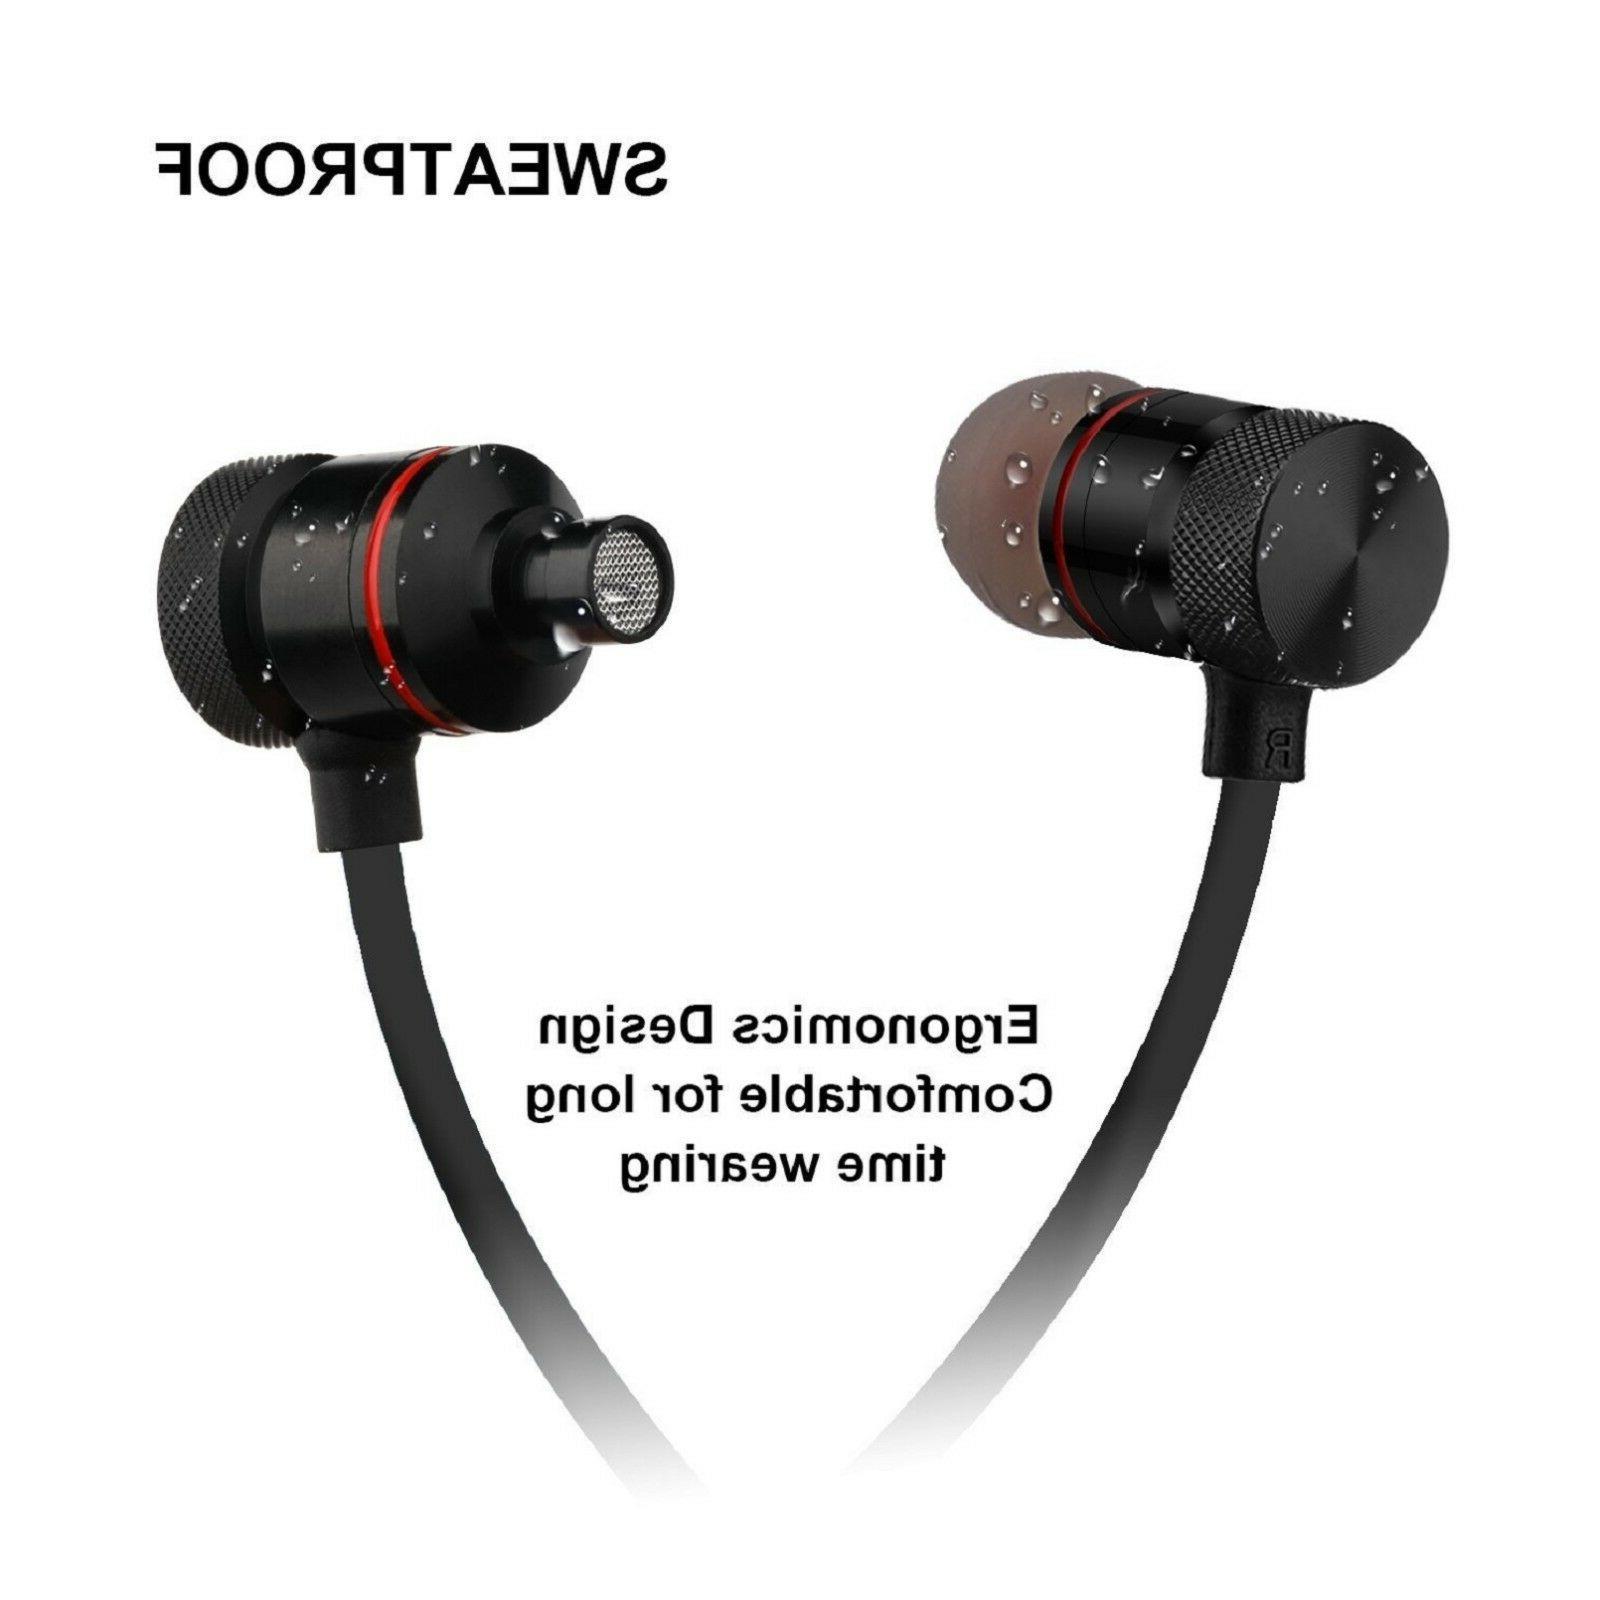 Wireless Bluetooth Earbuds In-Ear Stereo Headset Headphones